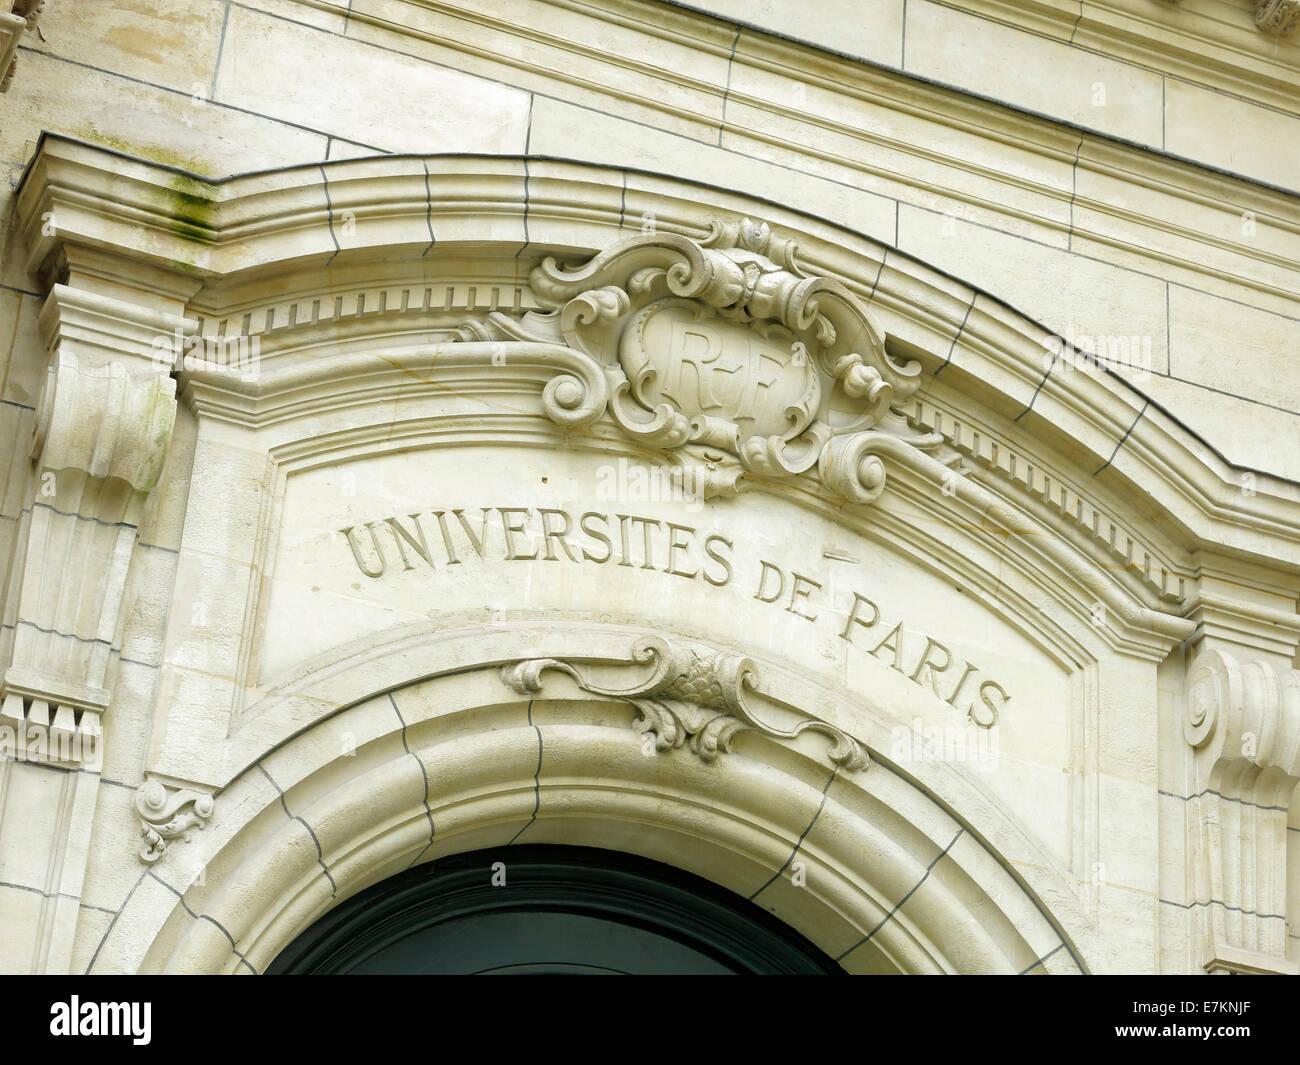 Sorbonne University of Paris doorway stone arch. - Stock Image